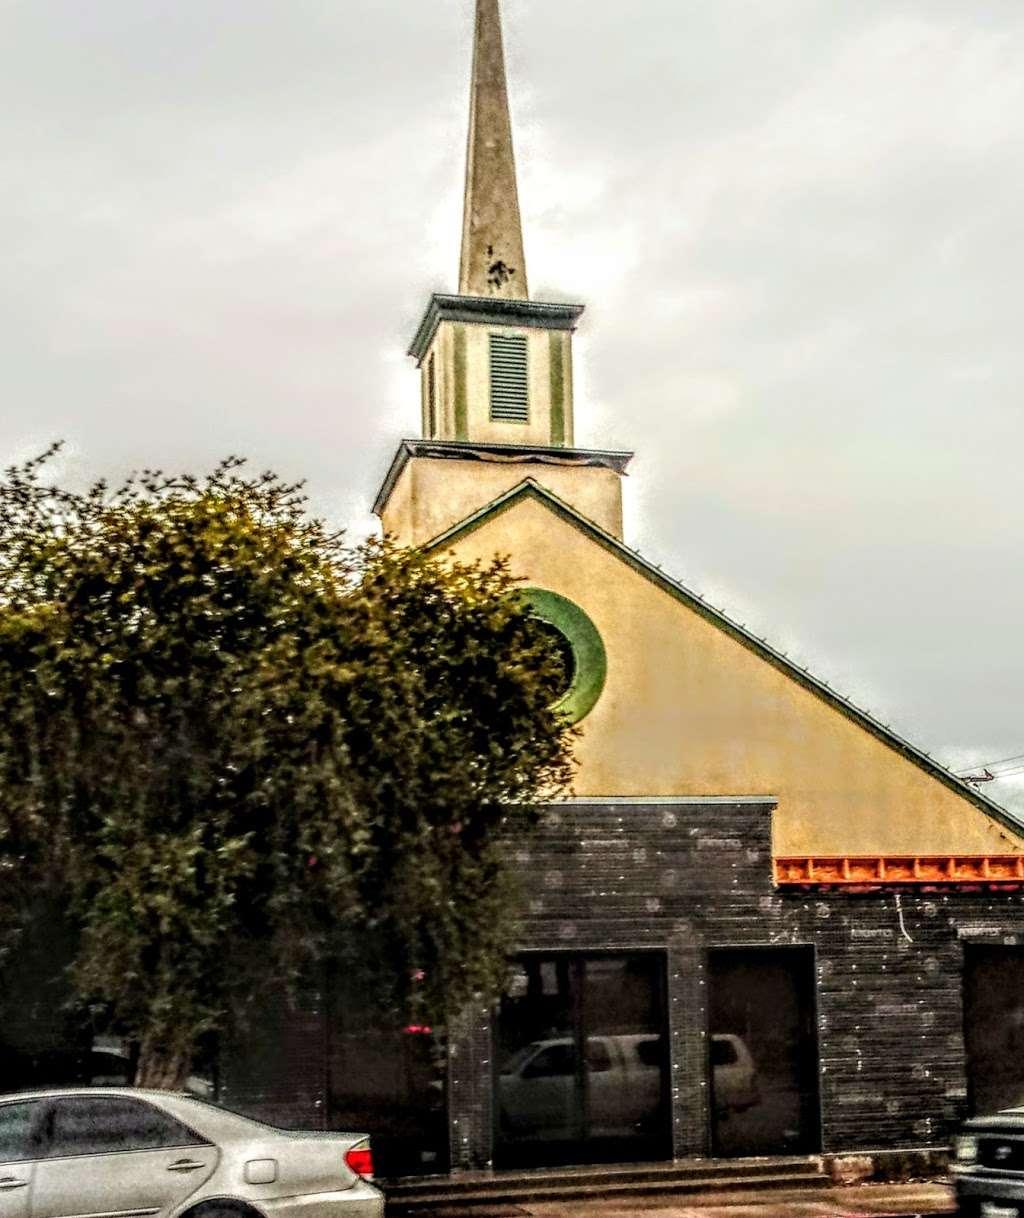 Bethel Baptist Church - church  | Photo 2 of 4 | Address: 1501 W Carson St, Torrance, CA 90501, USA | Phone: (310) 320-8505